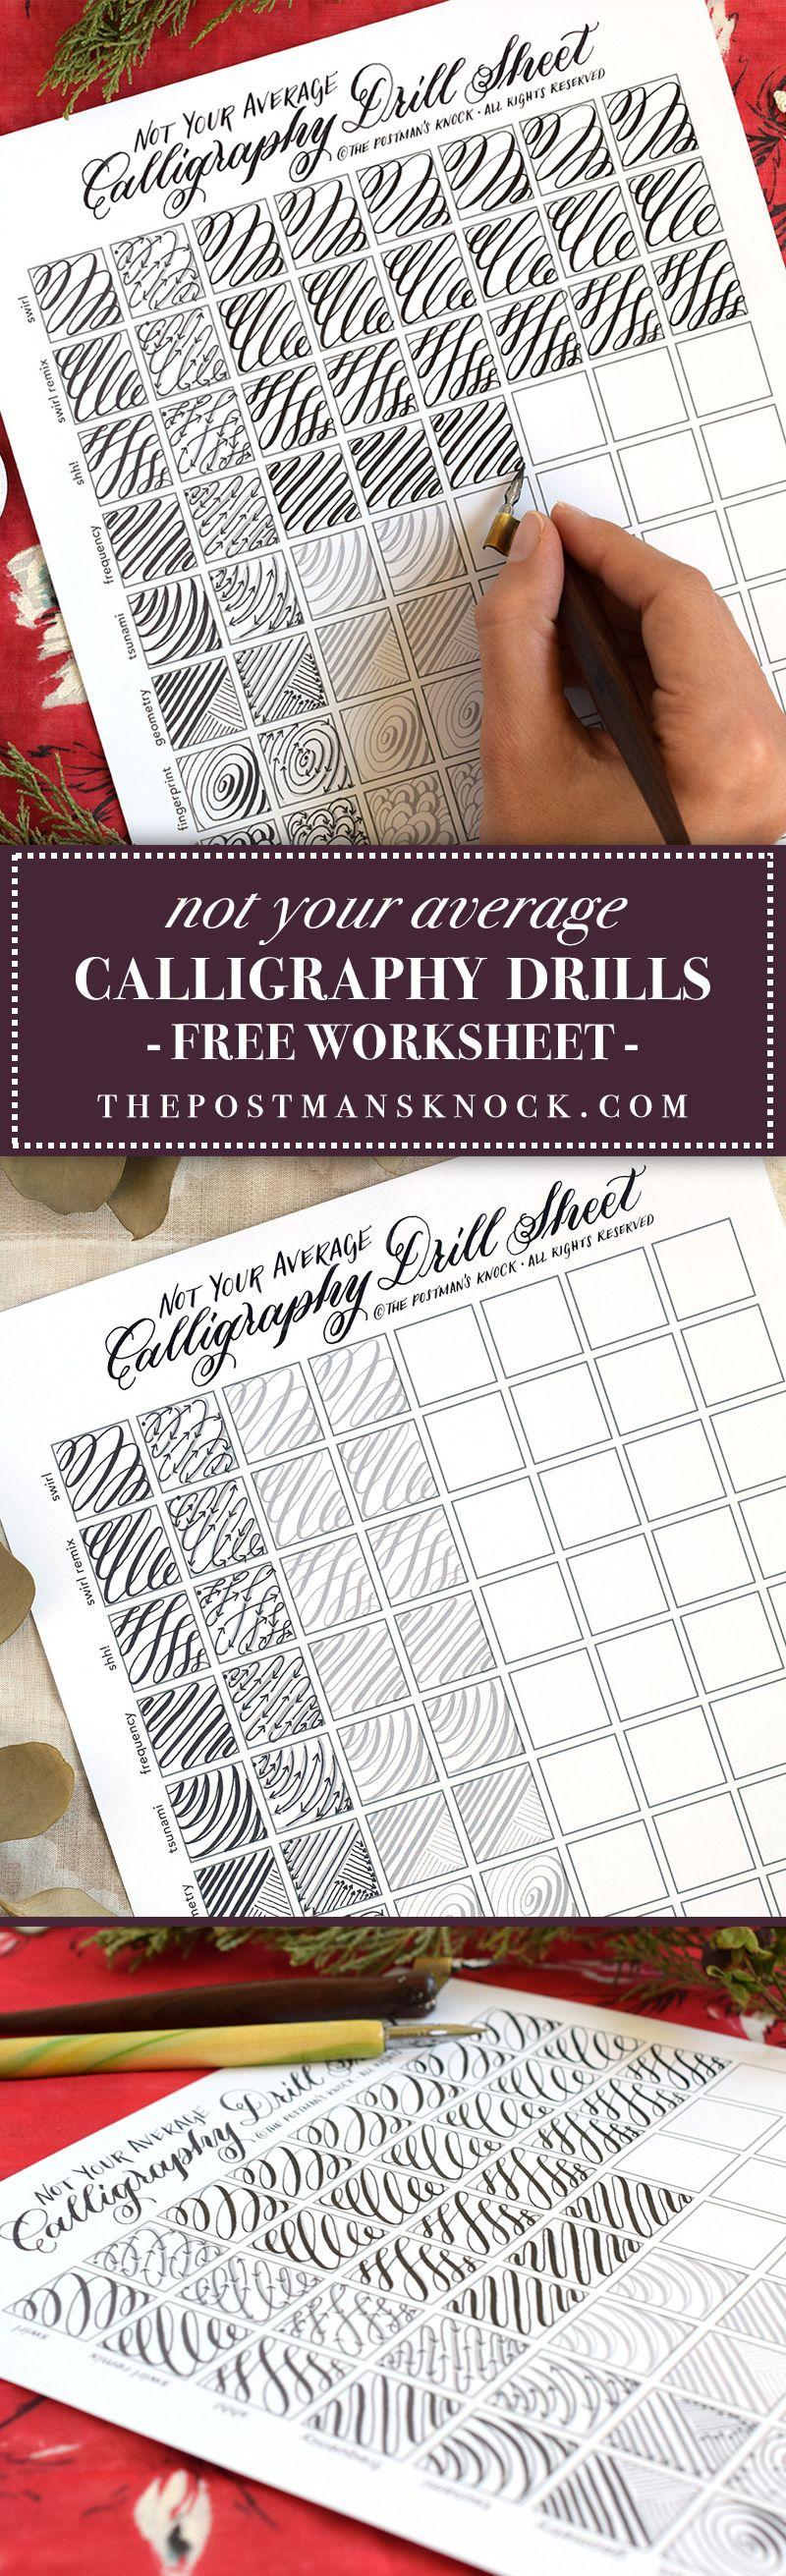 Not Your Average Calligraphy Drills Sheet   Kalligraphie, Schrift ...